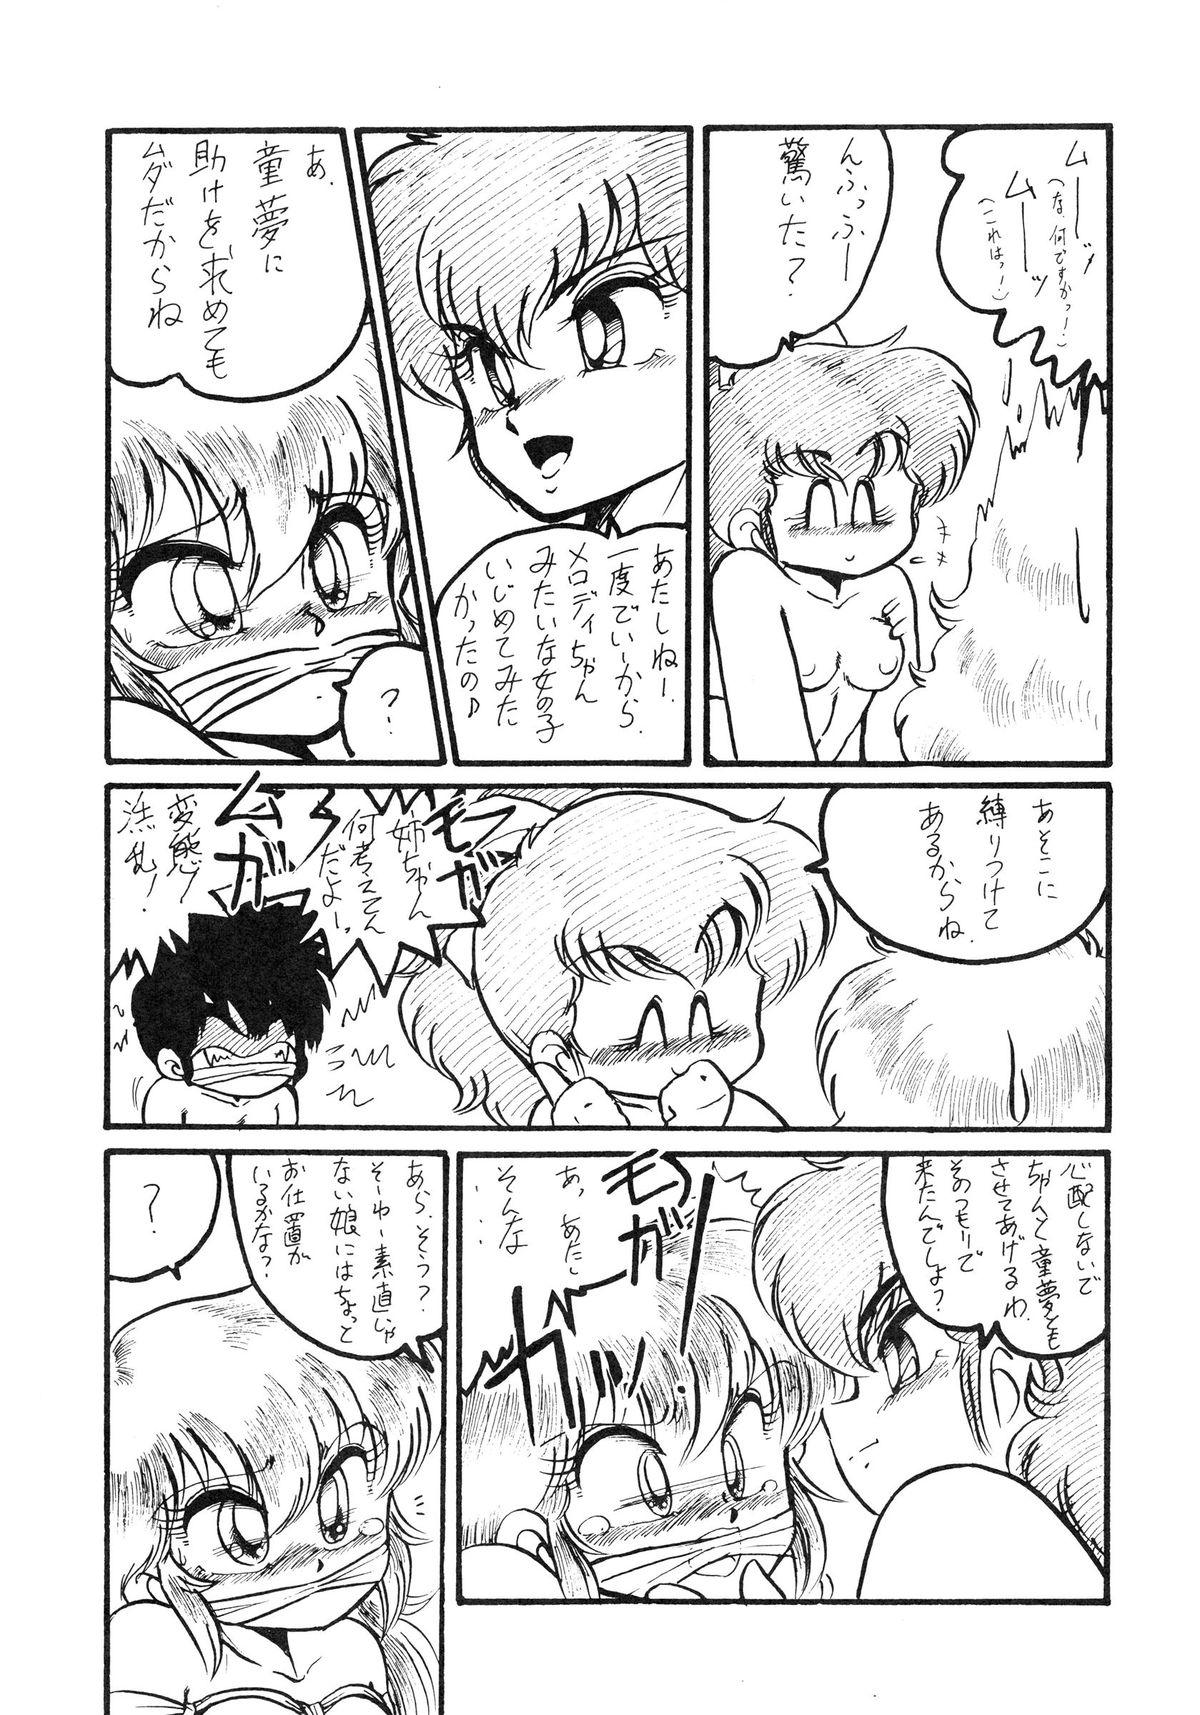 Hobaku Douga Musume - Zouho Kaiteiban 38